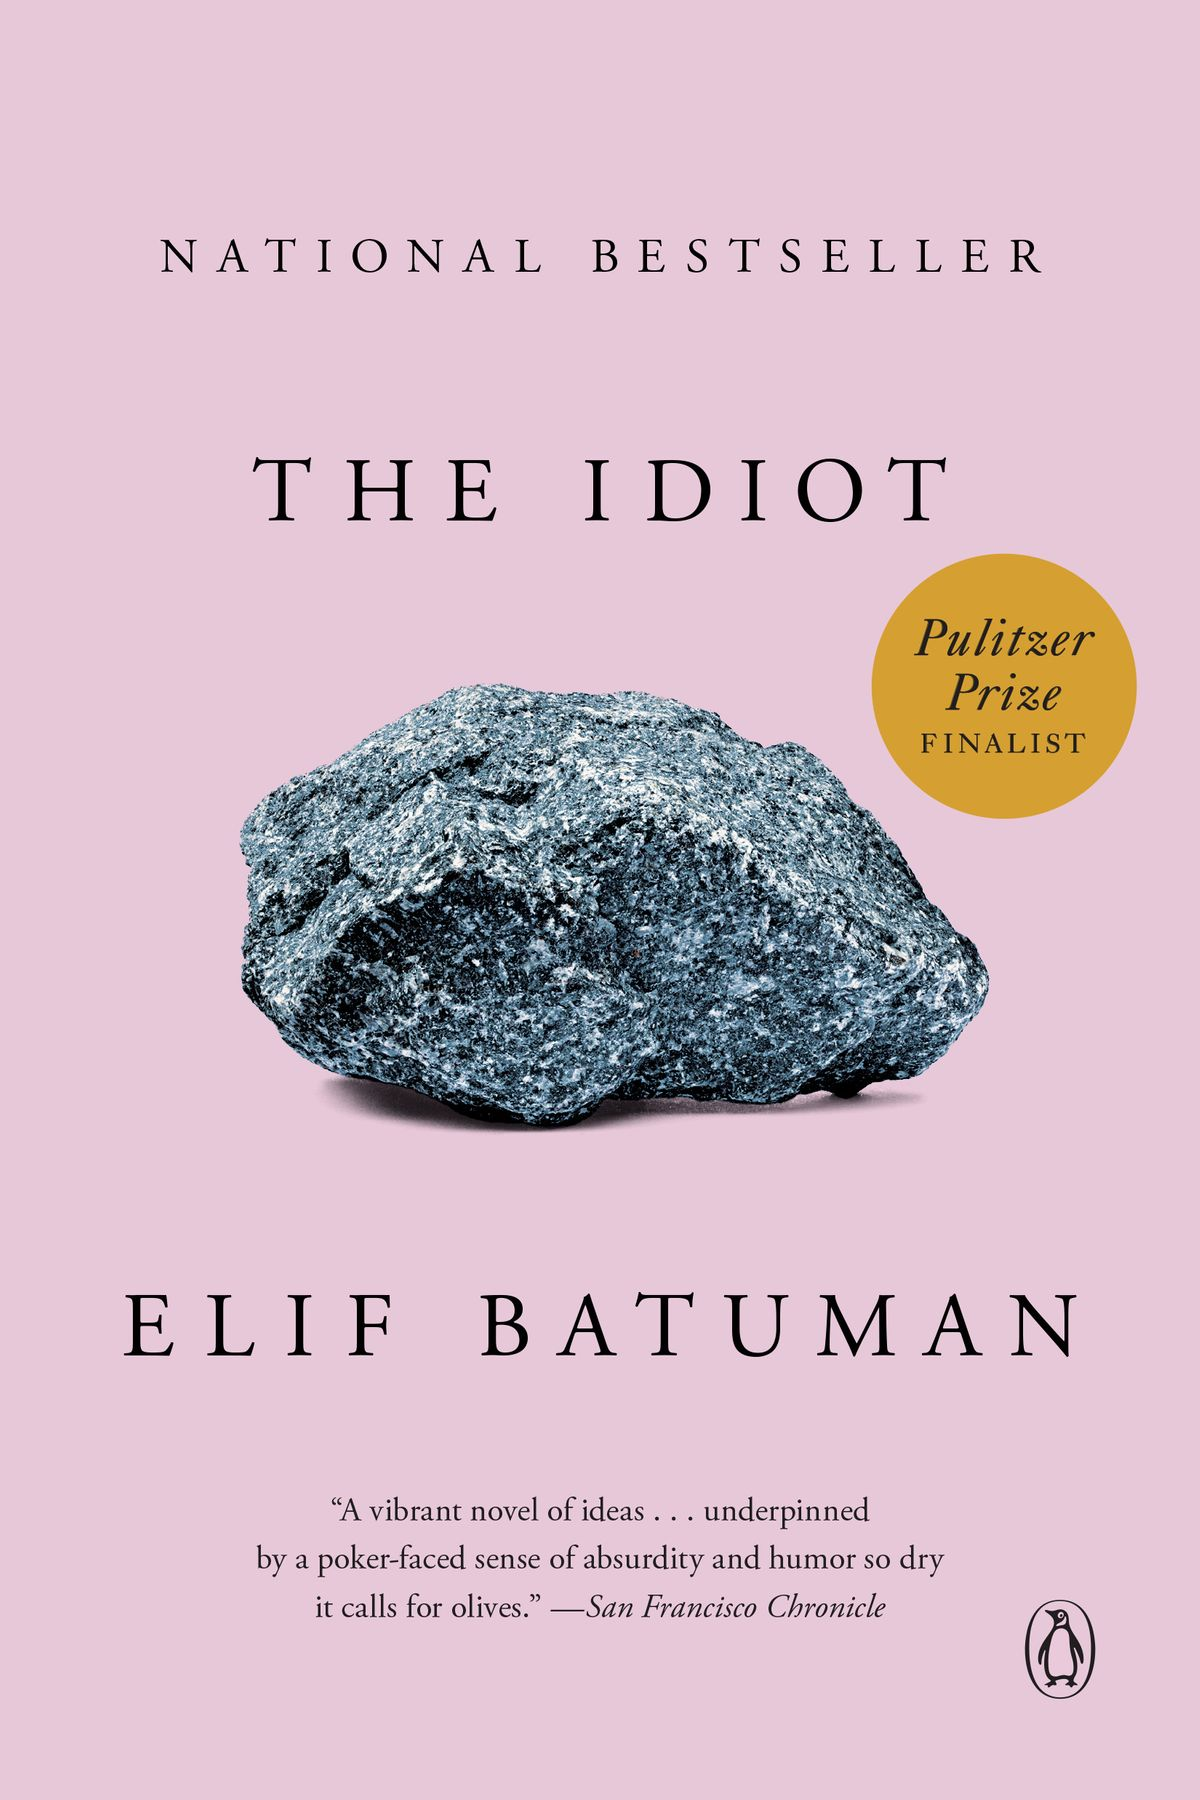 Elif Batuman - The Idiot